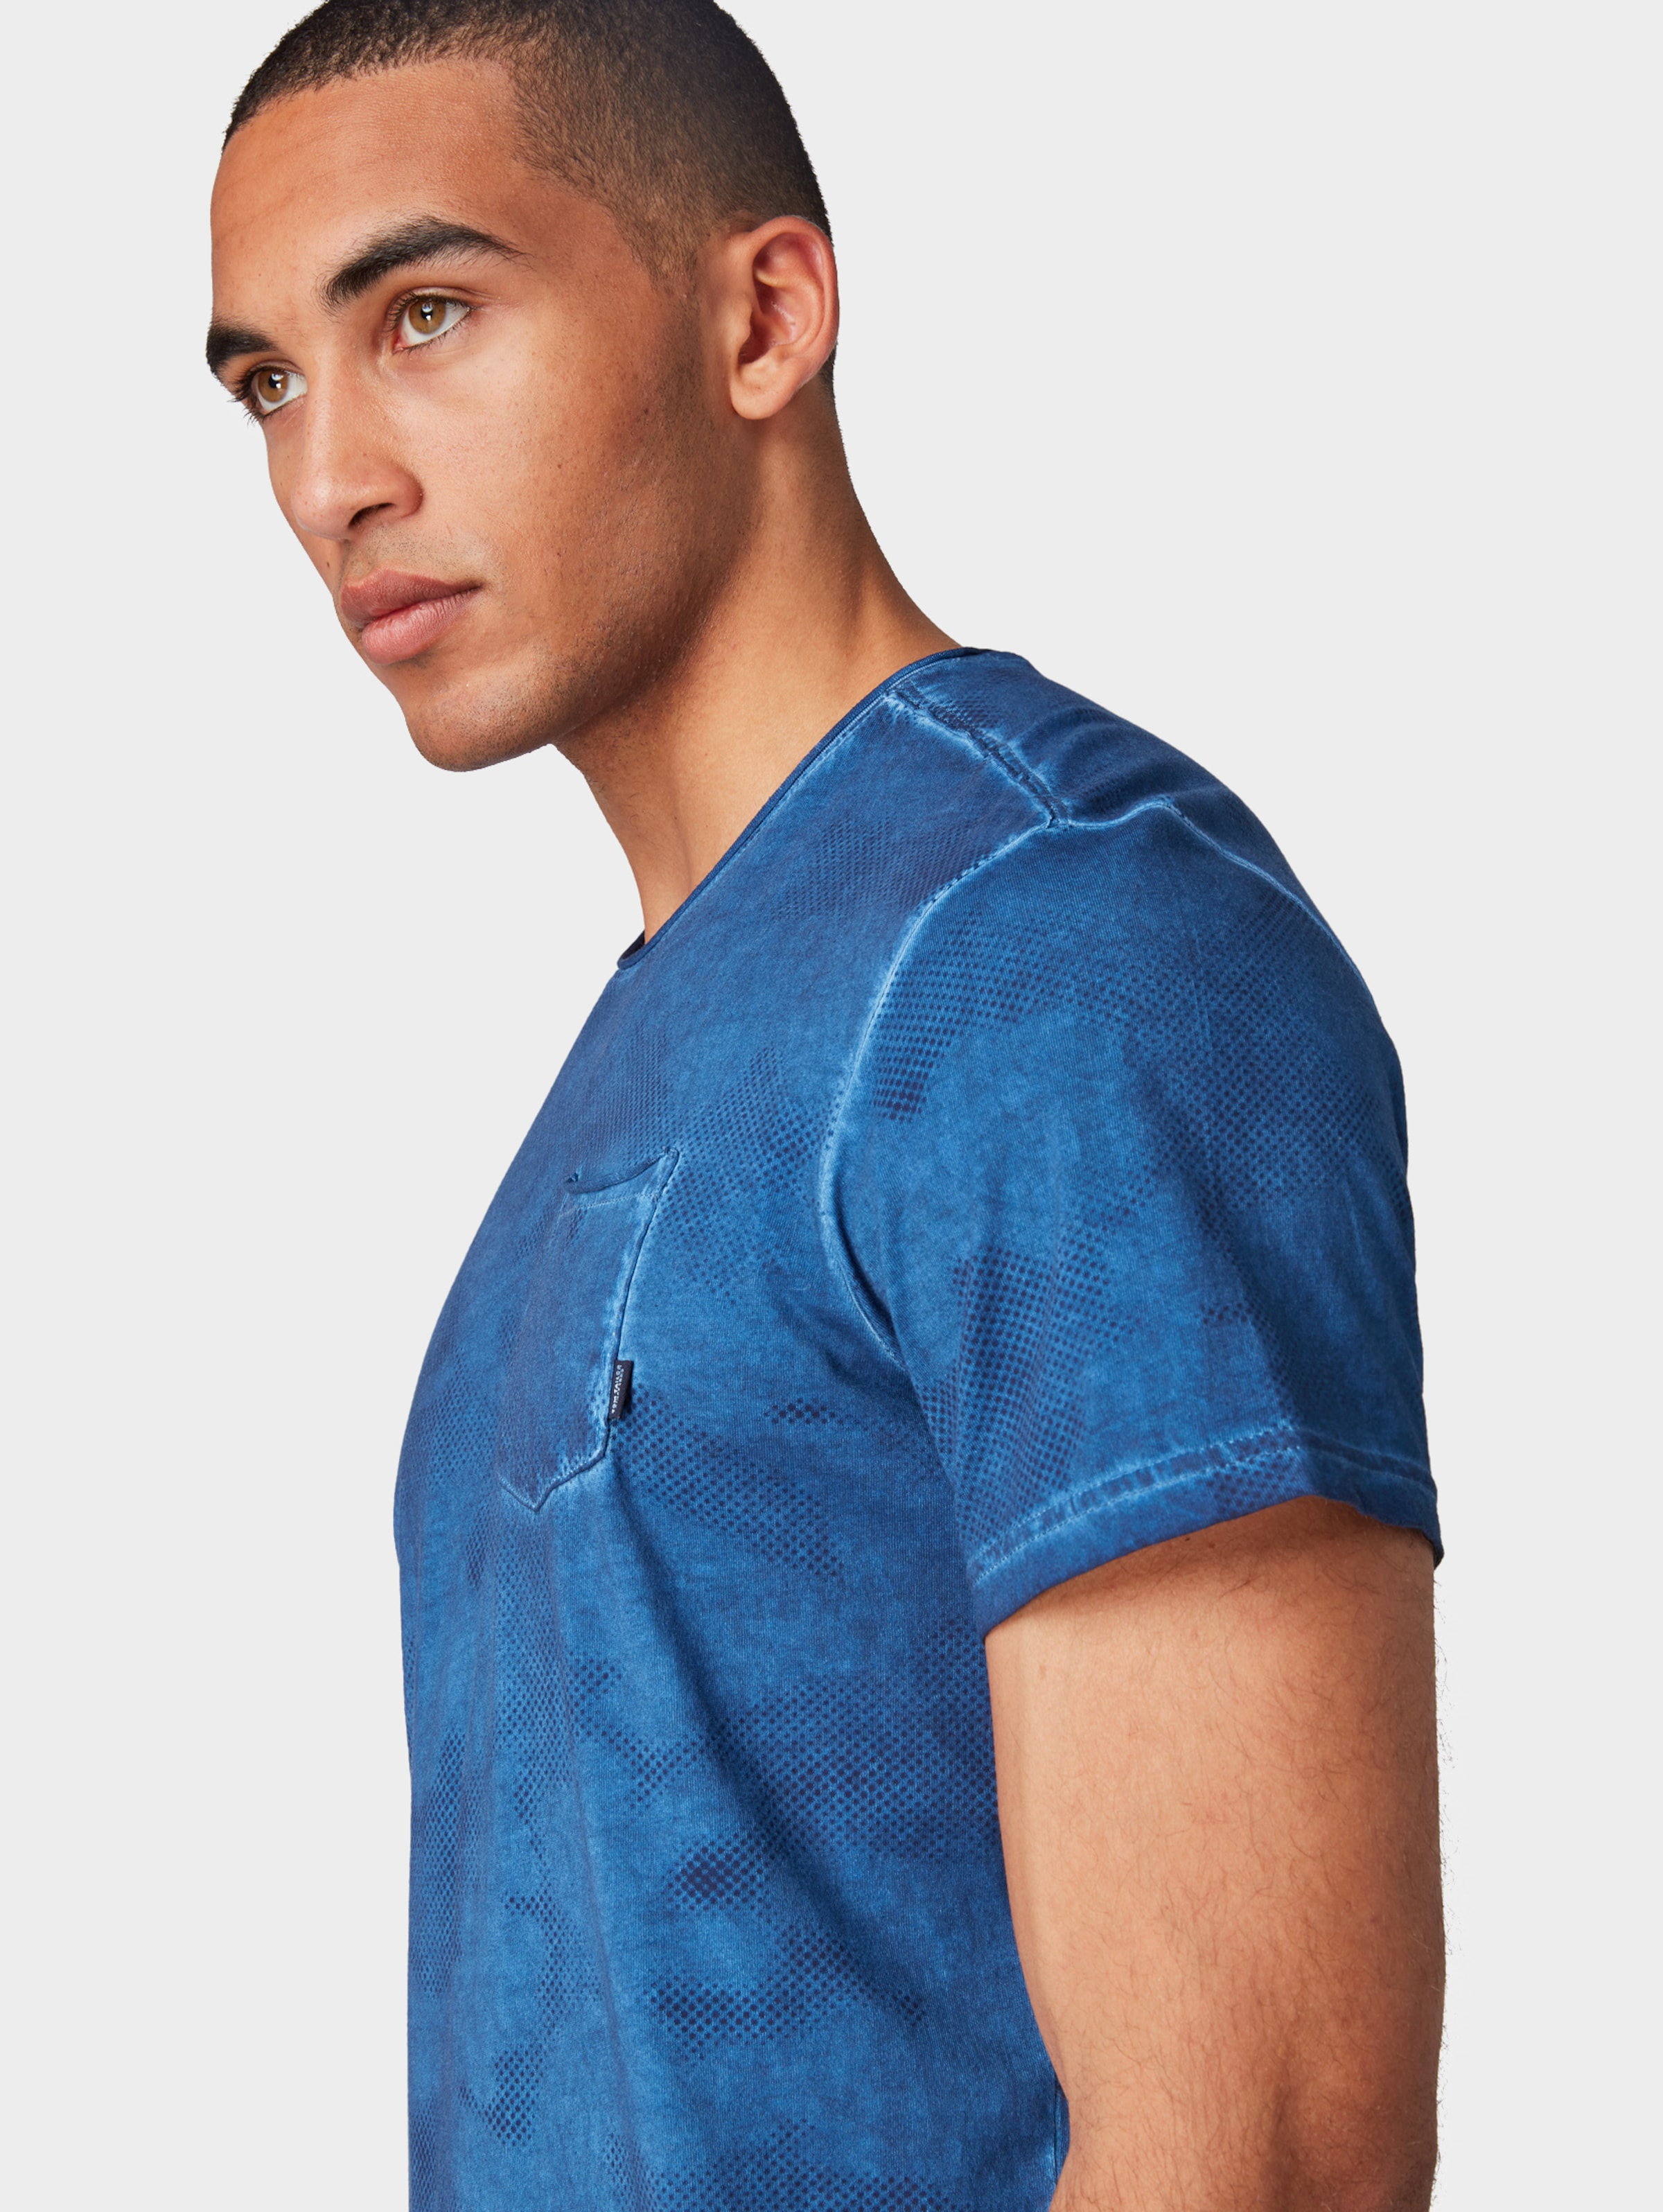 Tom Tailor T In BlauDunkelblau shirt zMpqUSGV